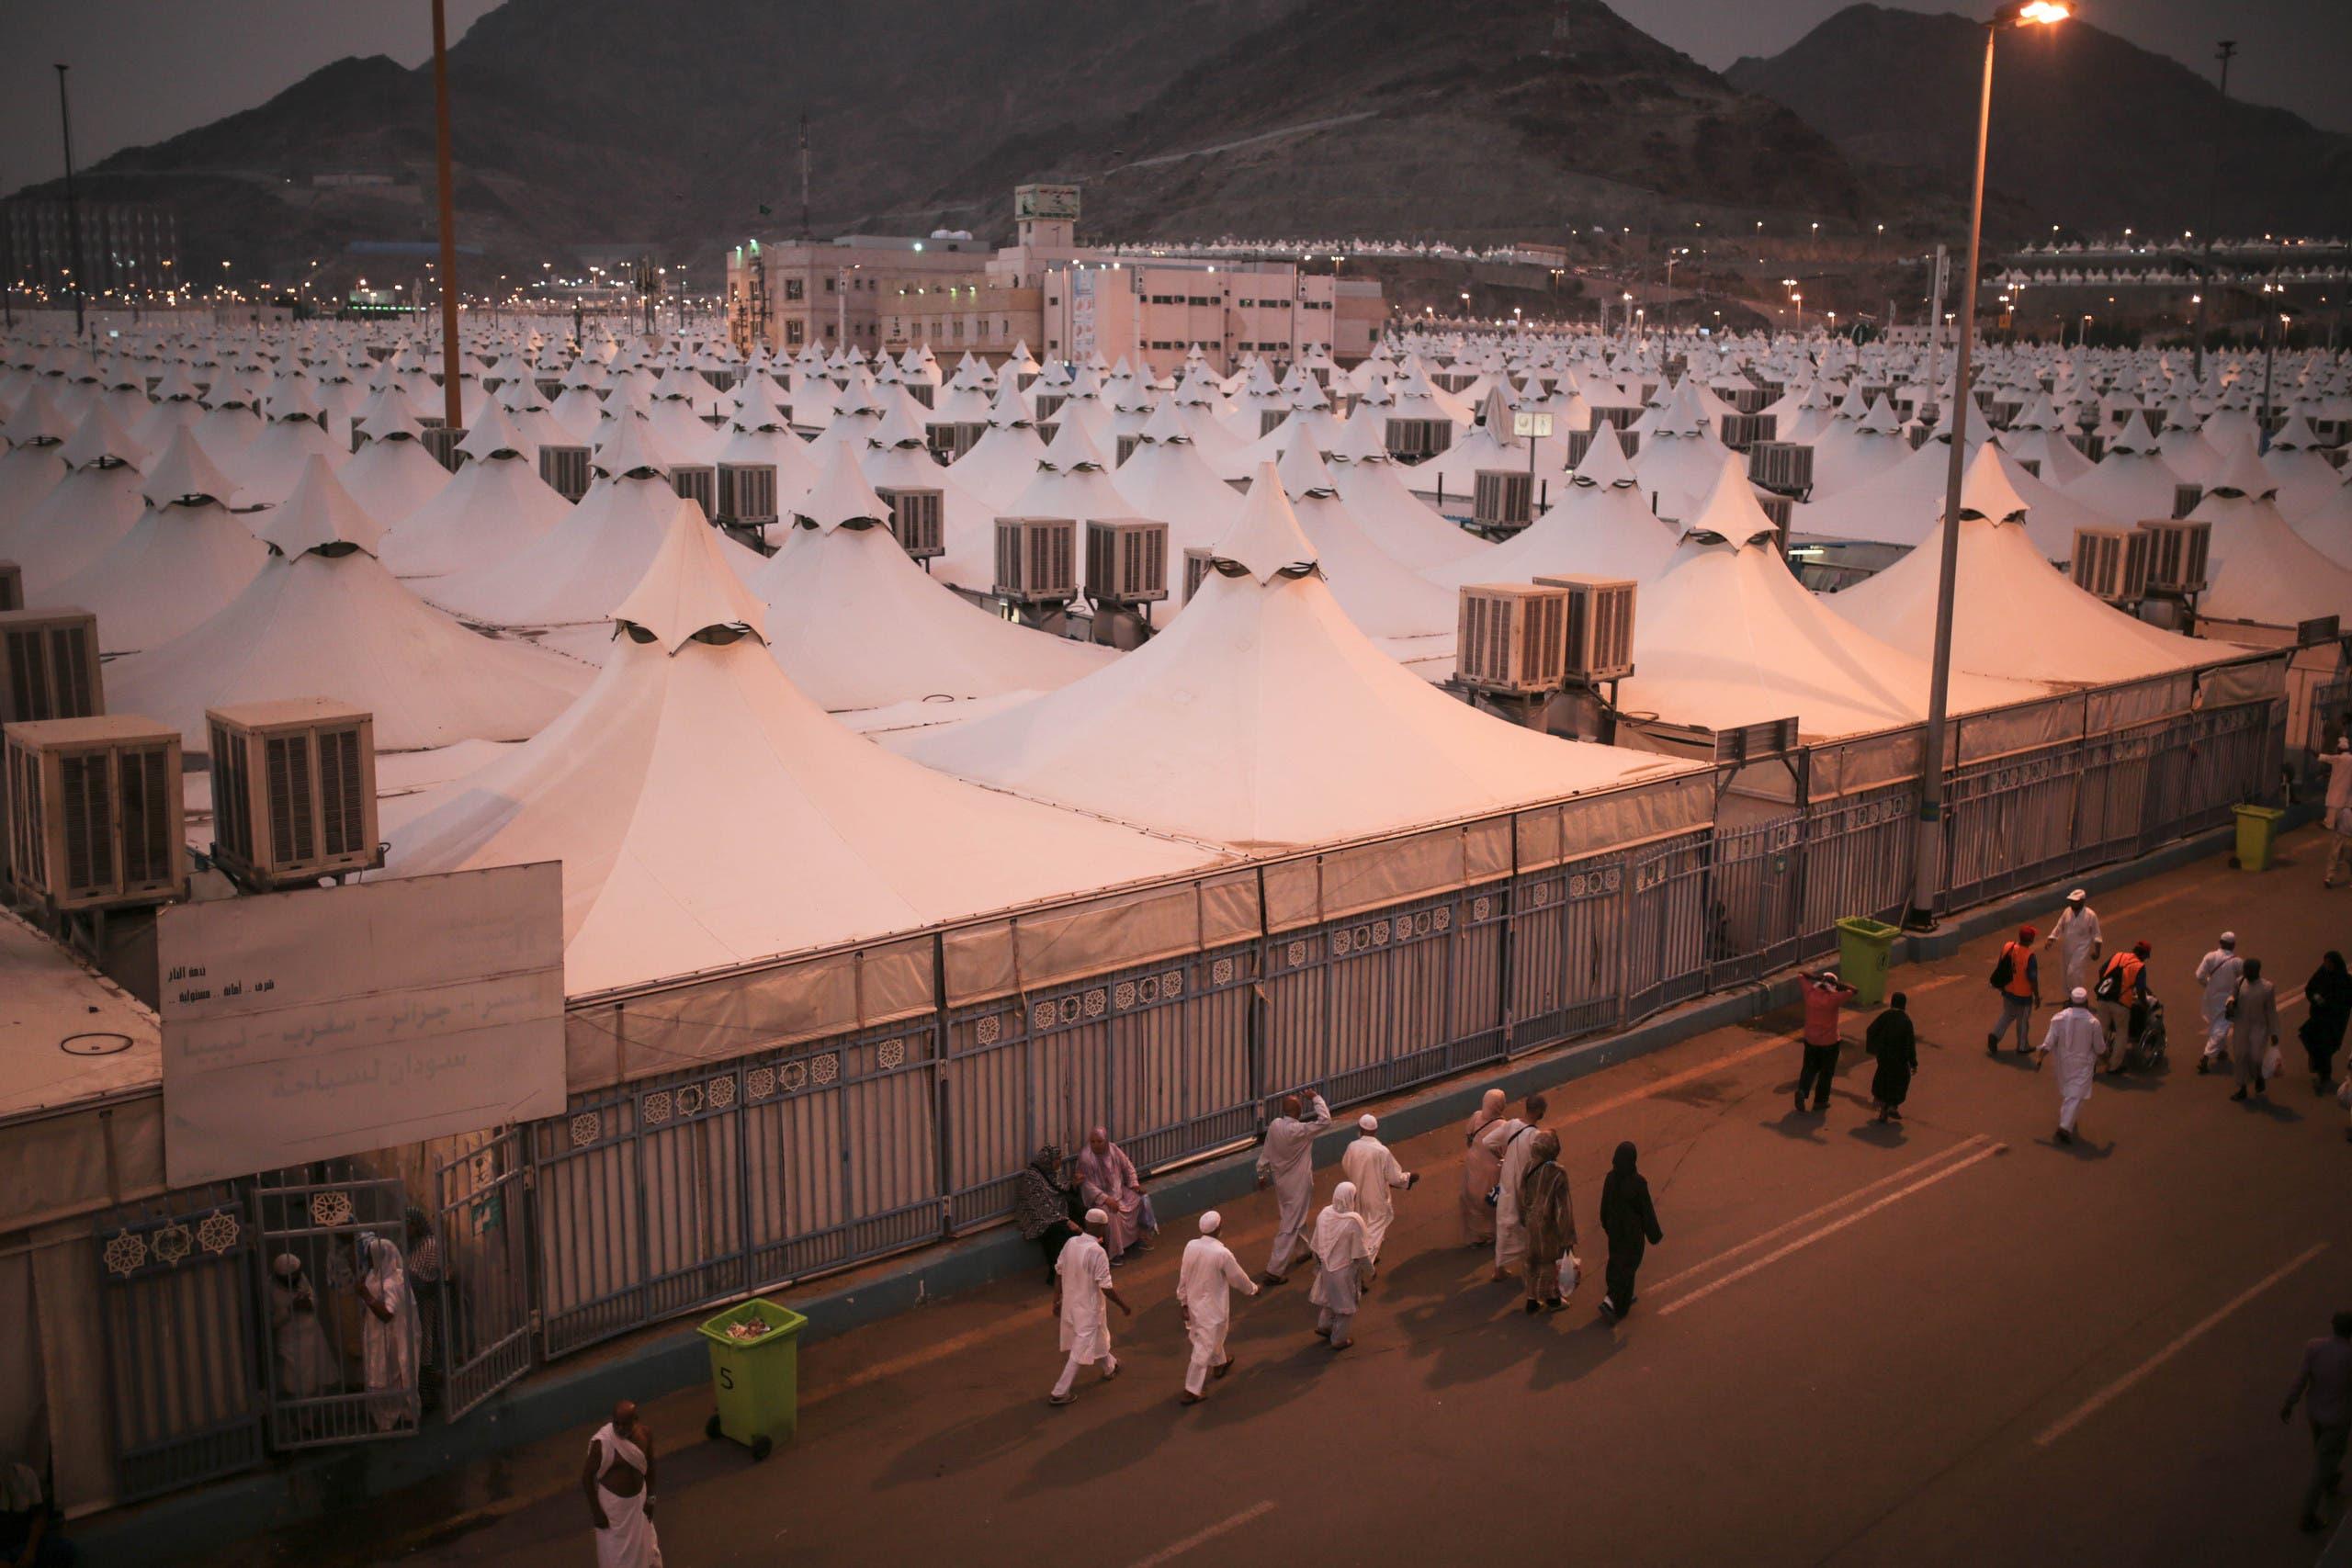 Hajj 2019: How to perform the Muslim pilgrimage - Al Arabiya